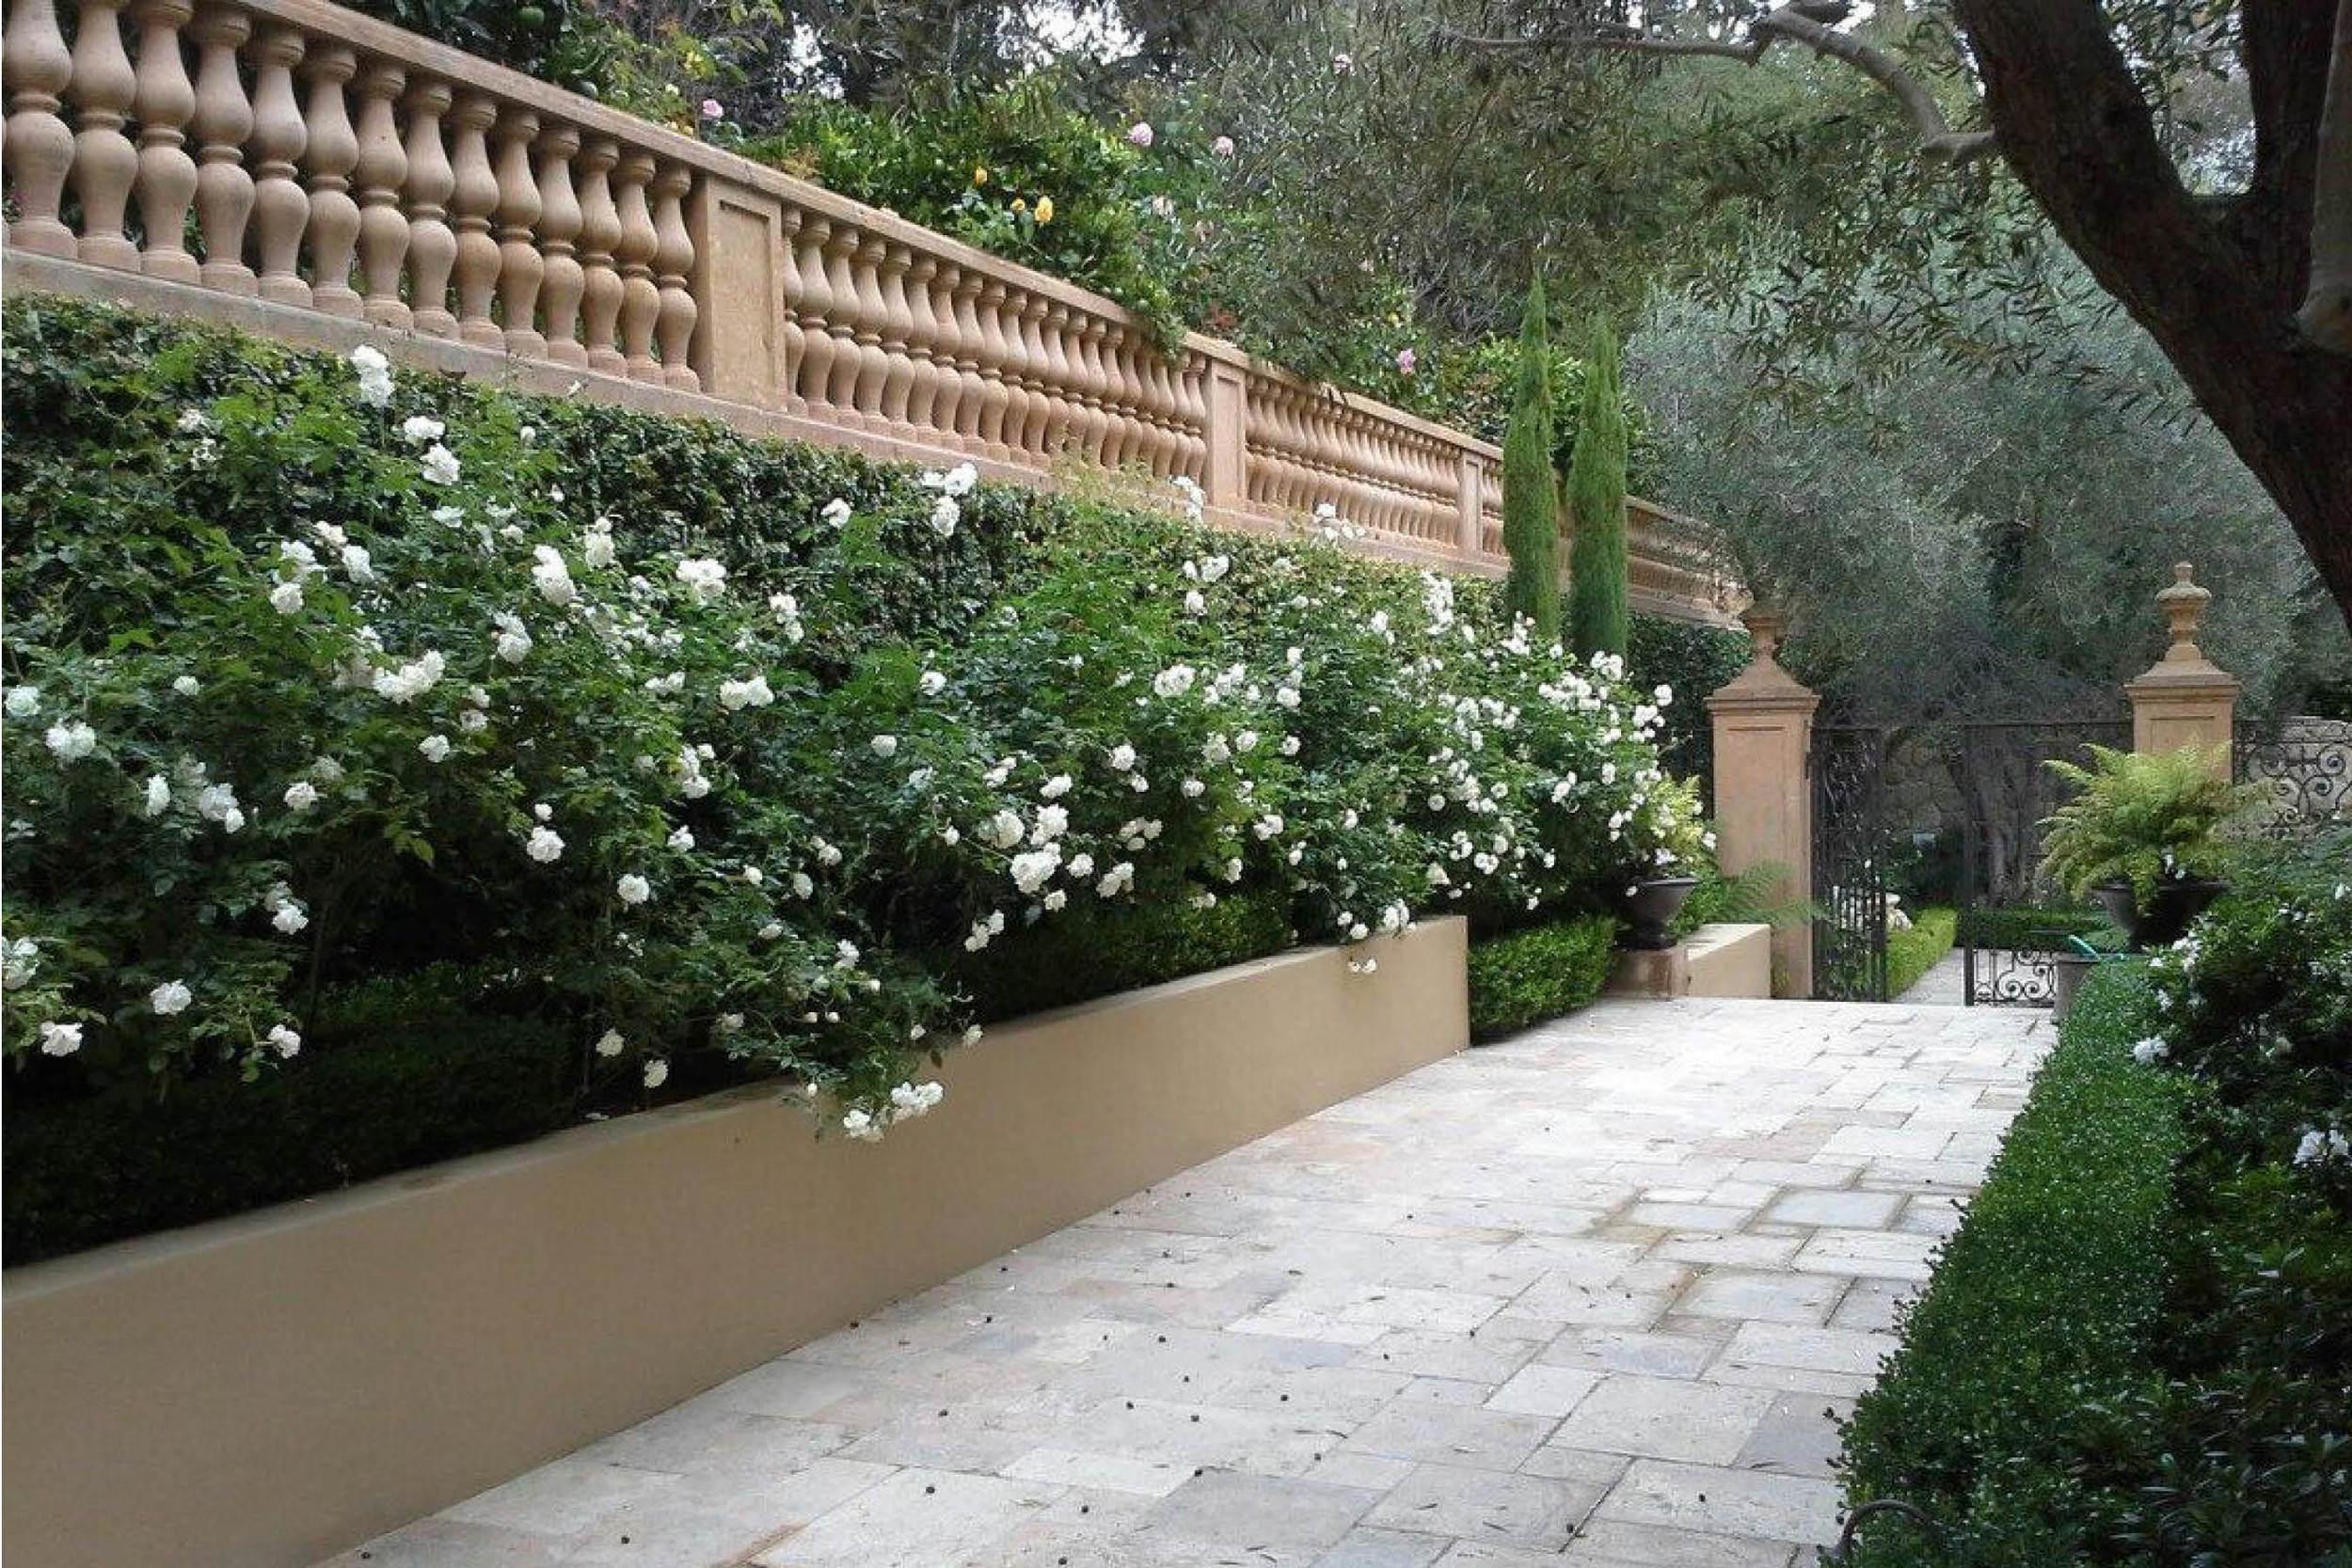 the-village-gardener-home-staging-plants-patio-decor-maintenance-interior-orchids-santa-barbara-carpinteria-losangeles-pasadena-santaynez  (3).jpg